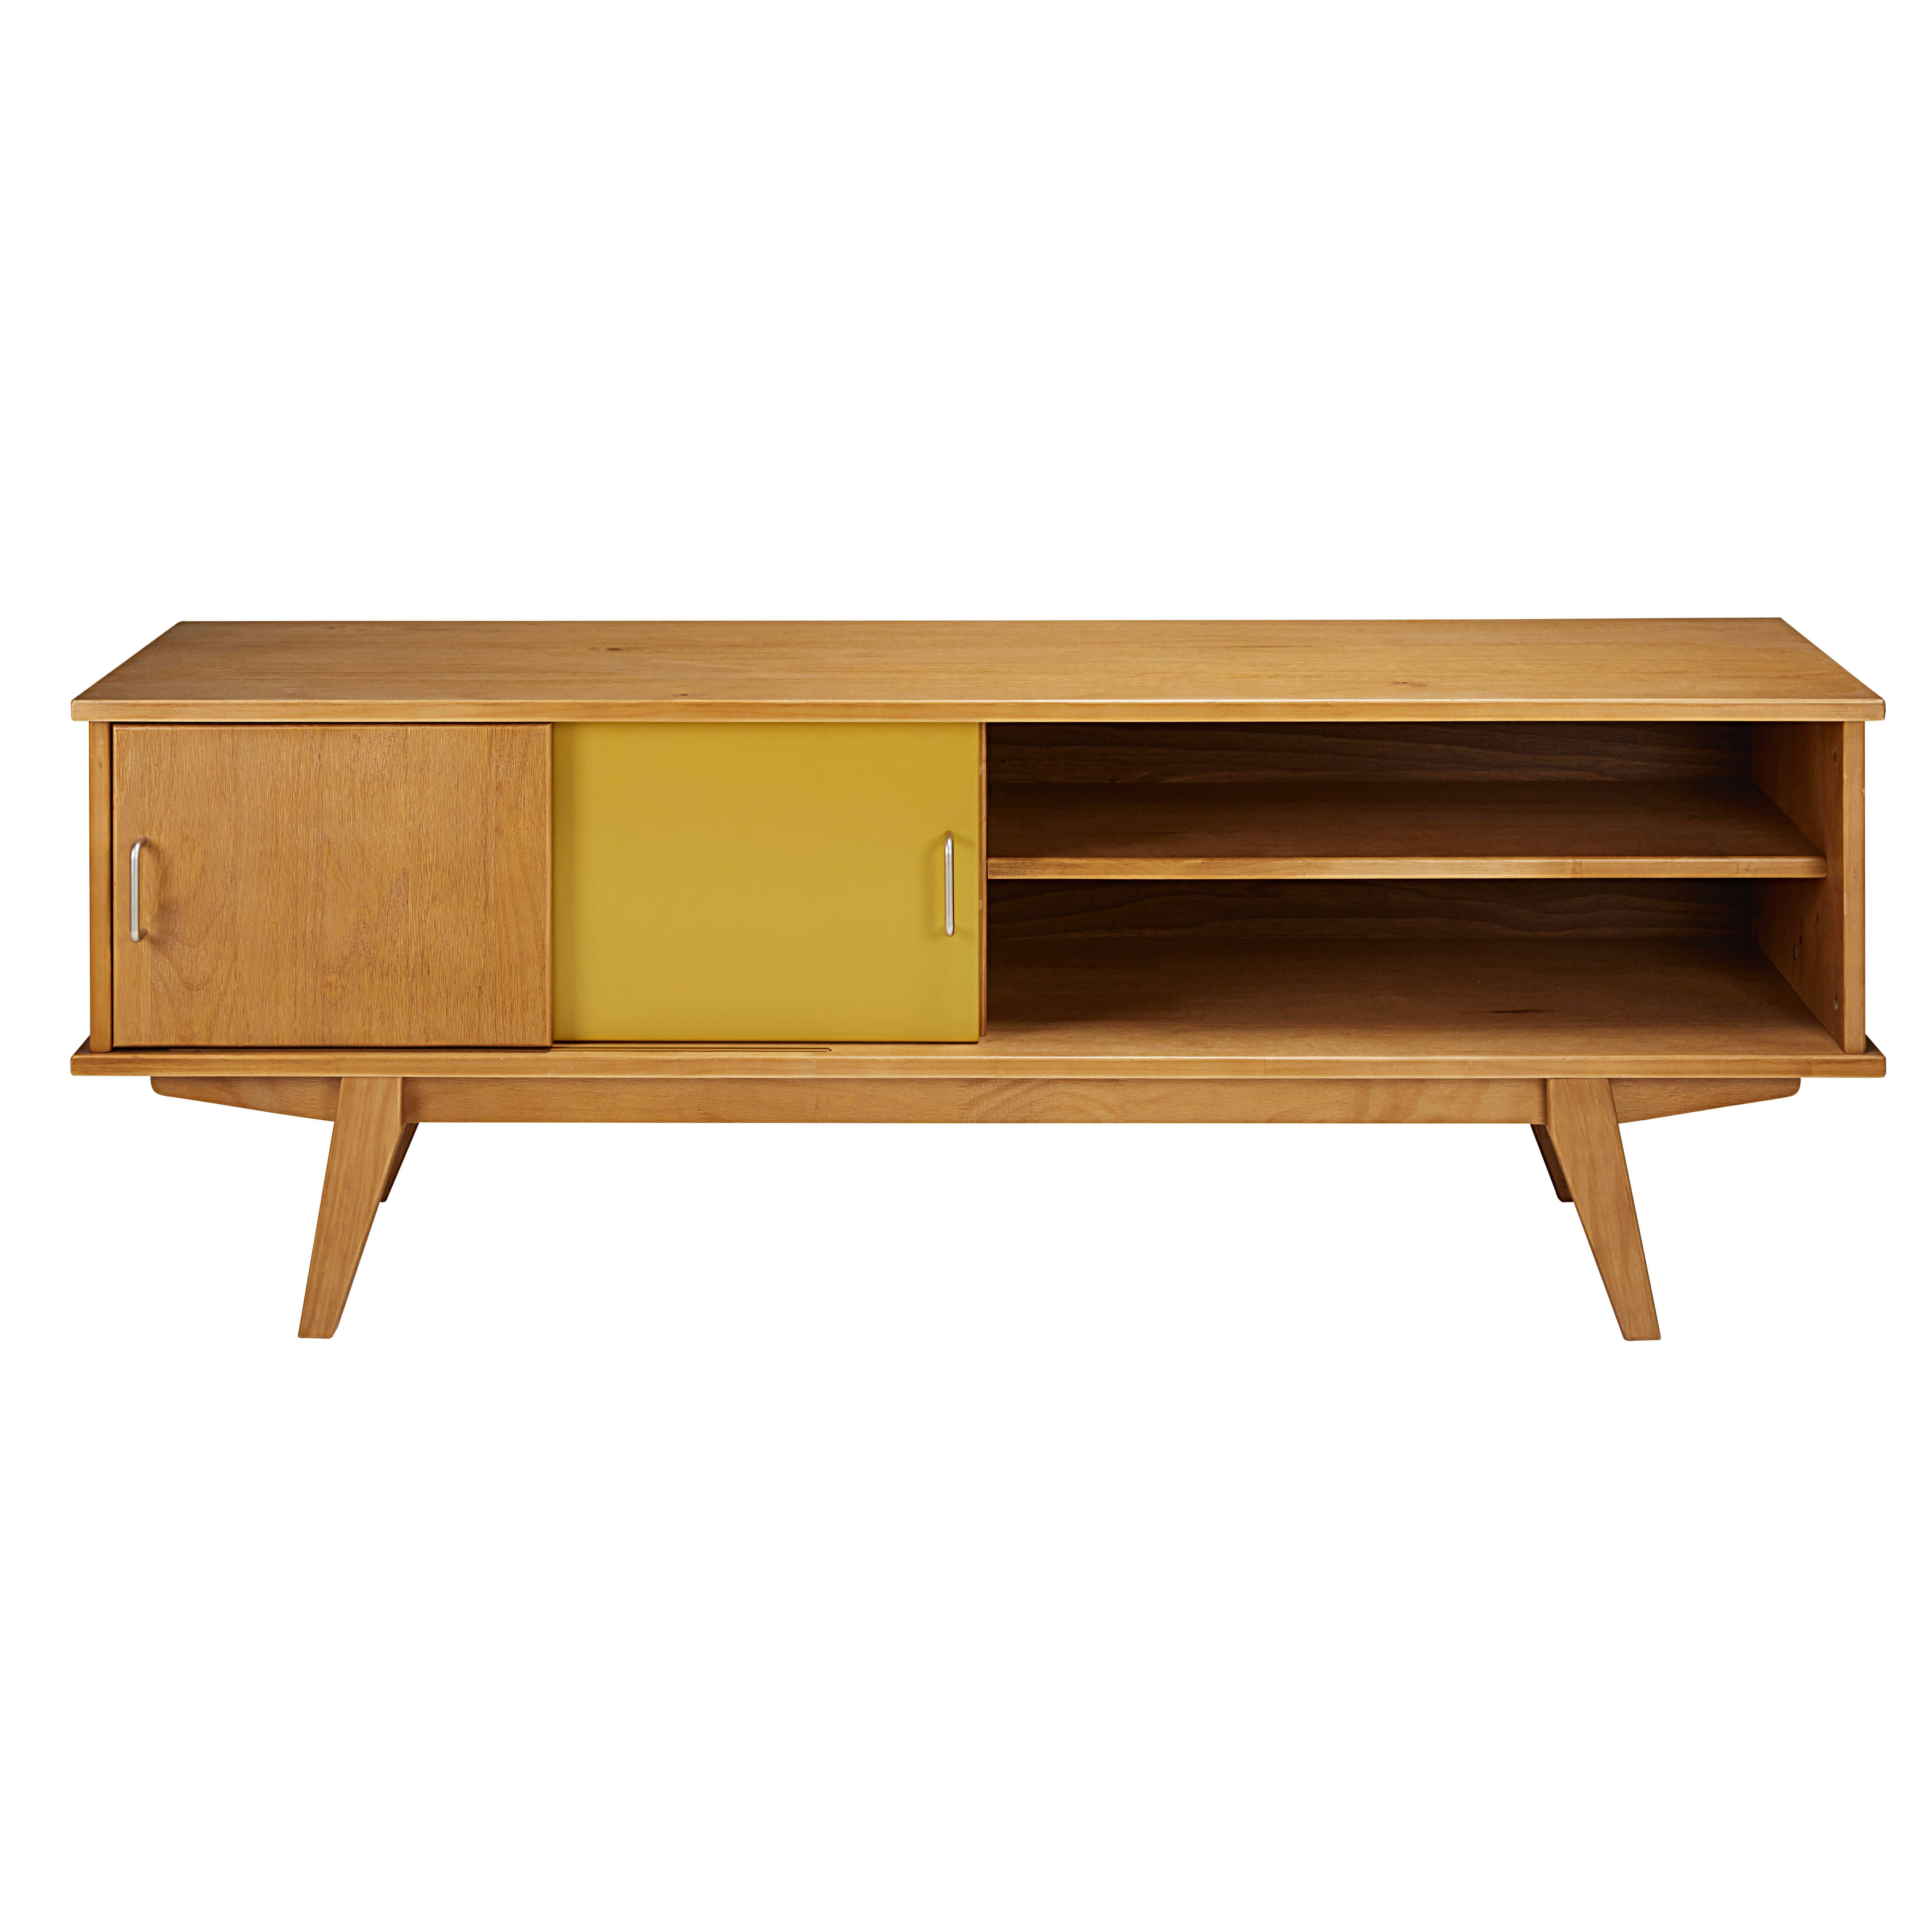 Meuble Tv Vintage 2 Portes Tricolore Tv Unit Tv Furniture Furniture